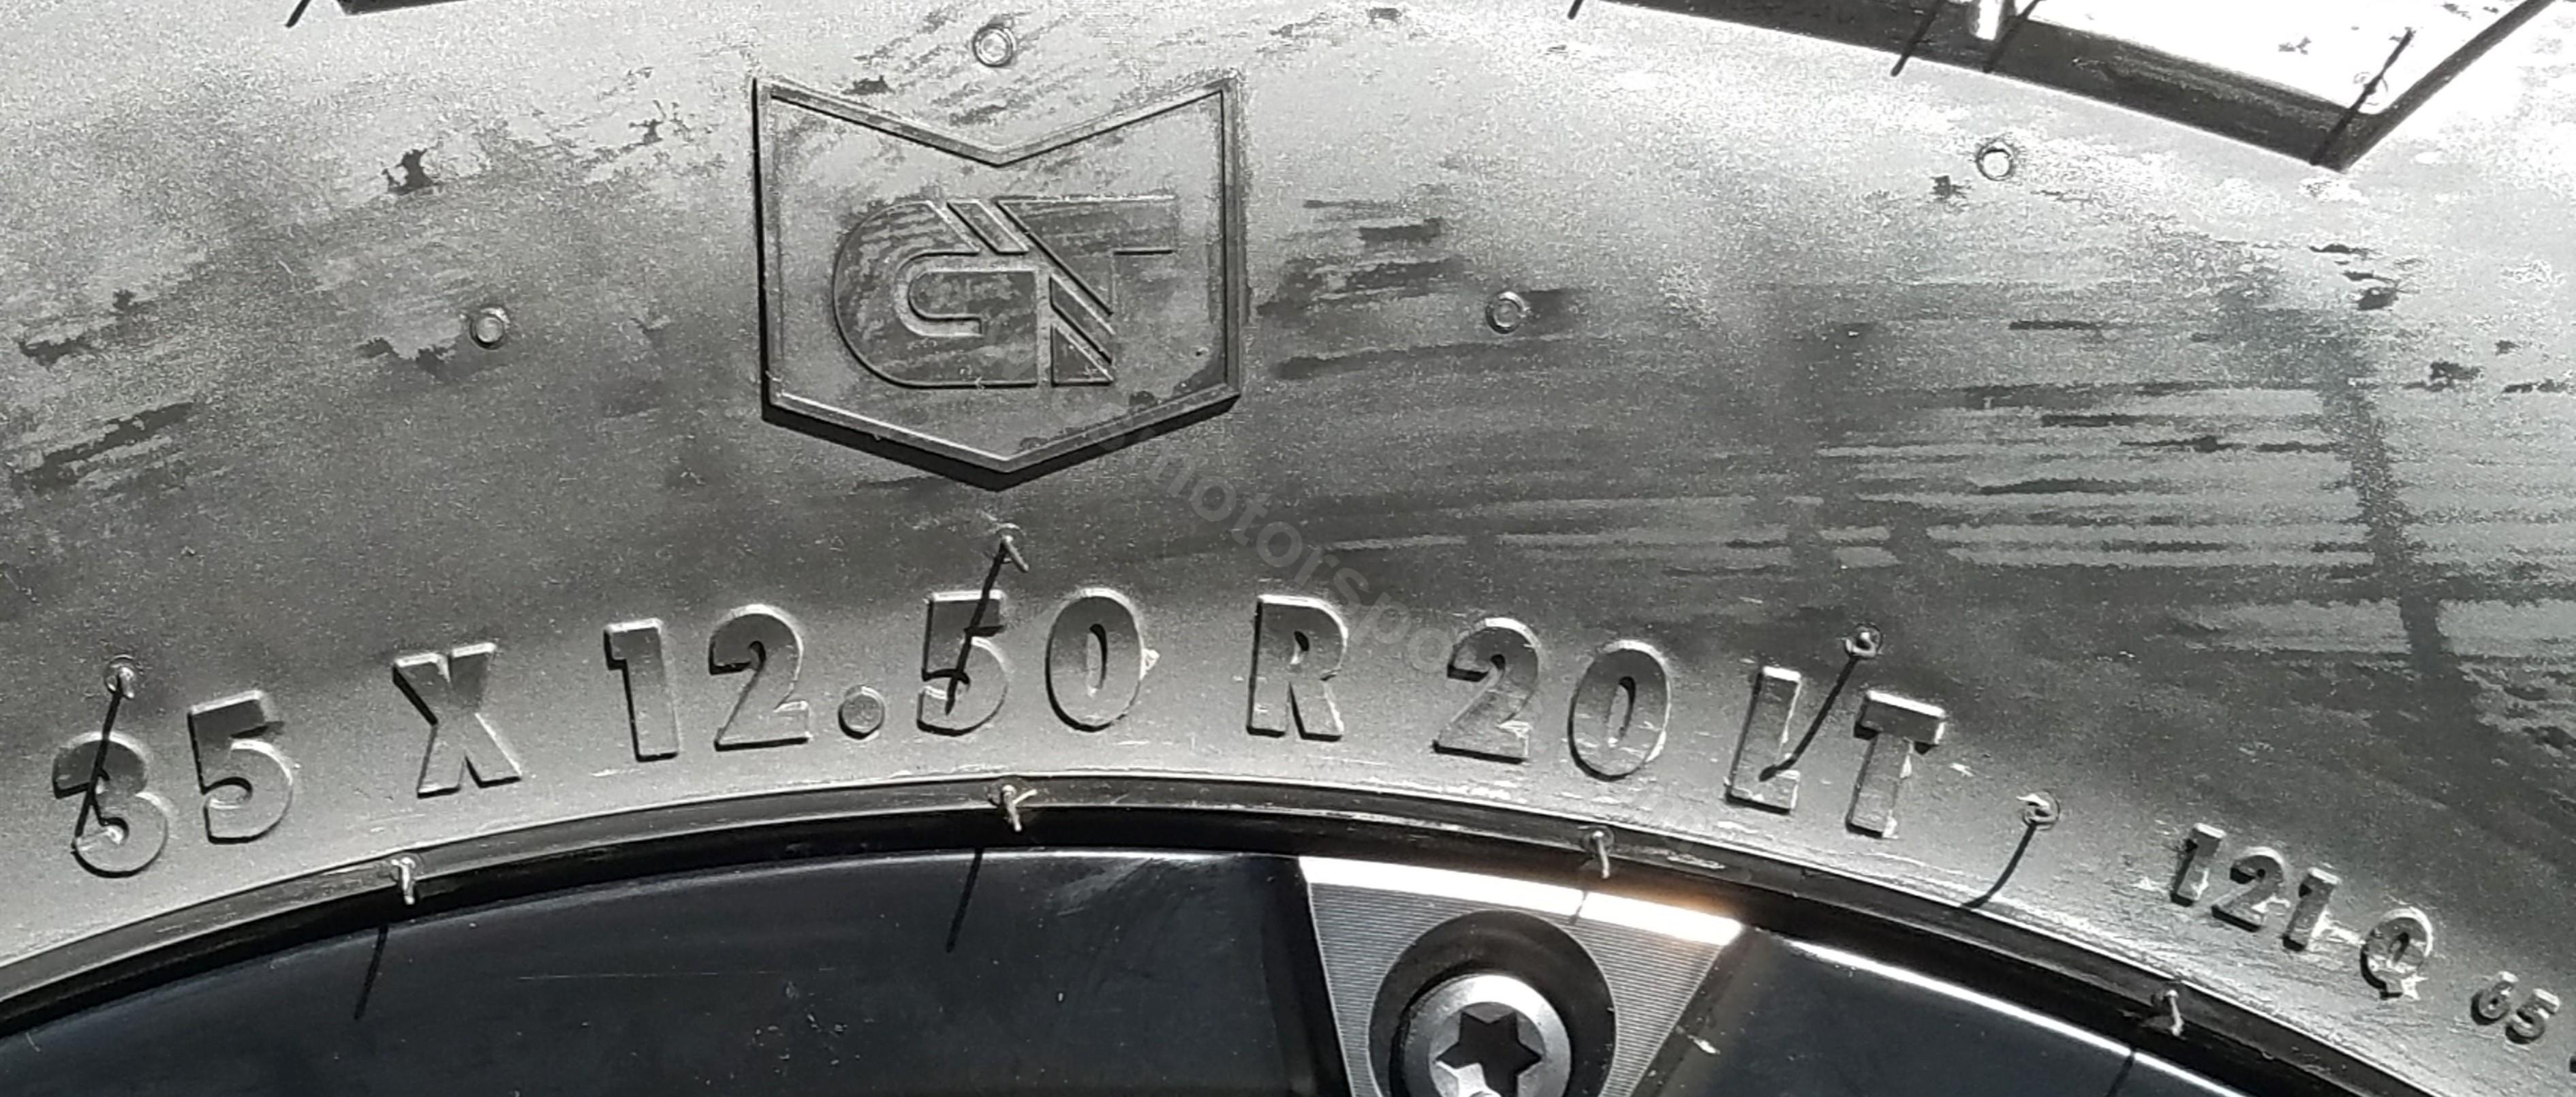 2016 Toyota Tundra - Mark Rose Fsh'g